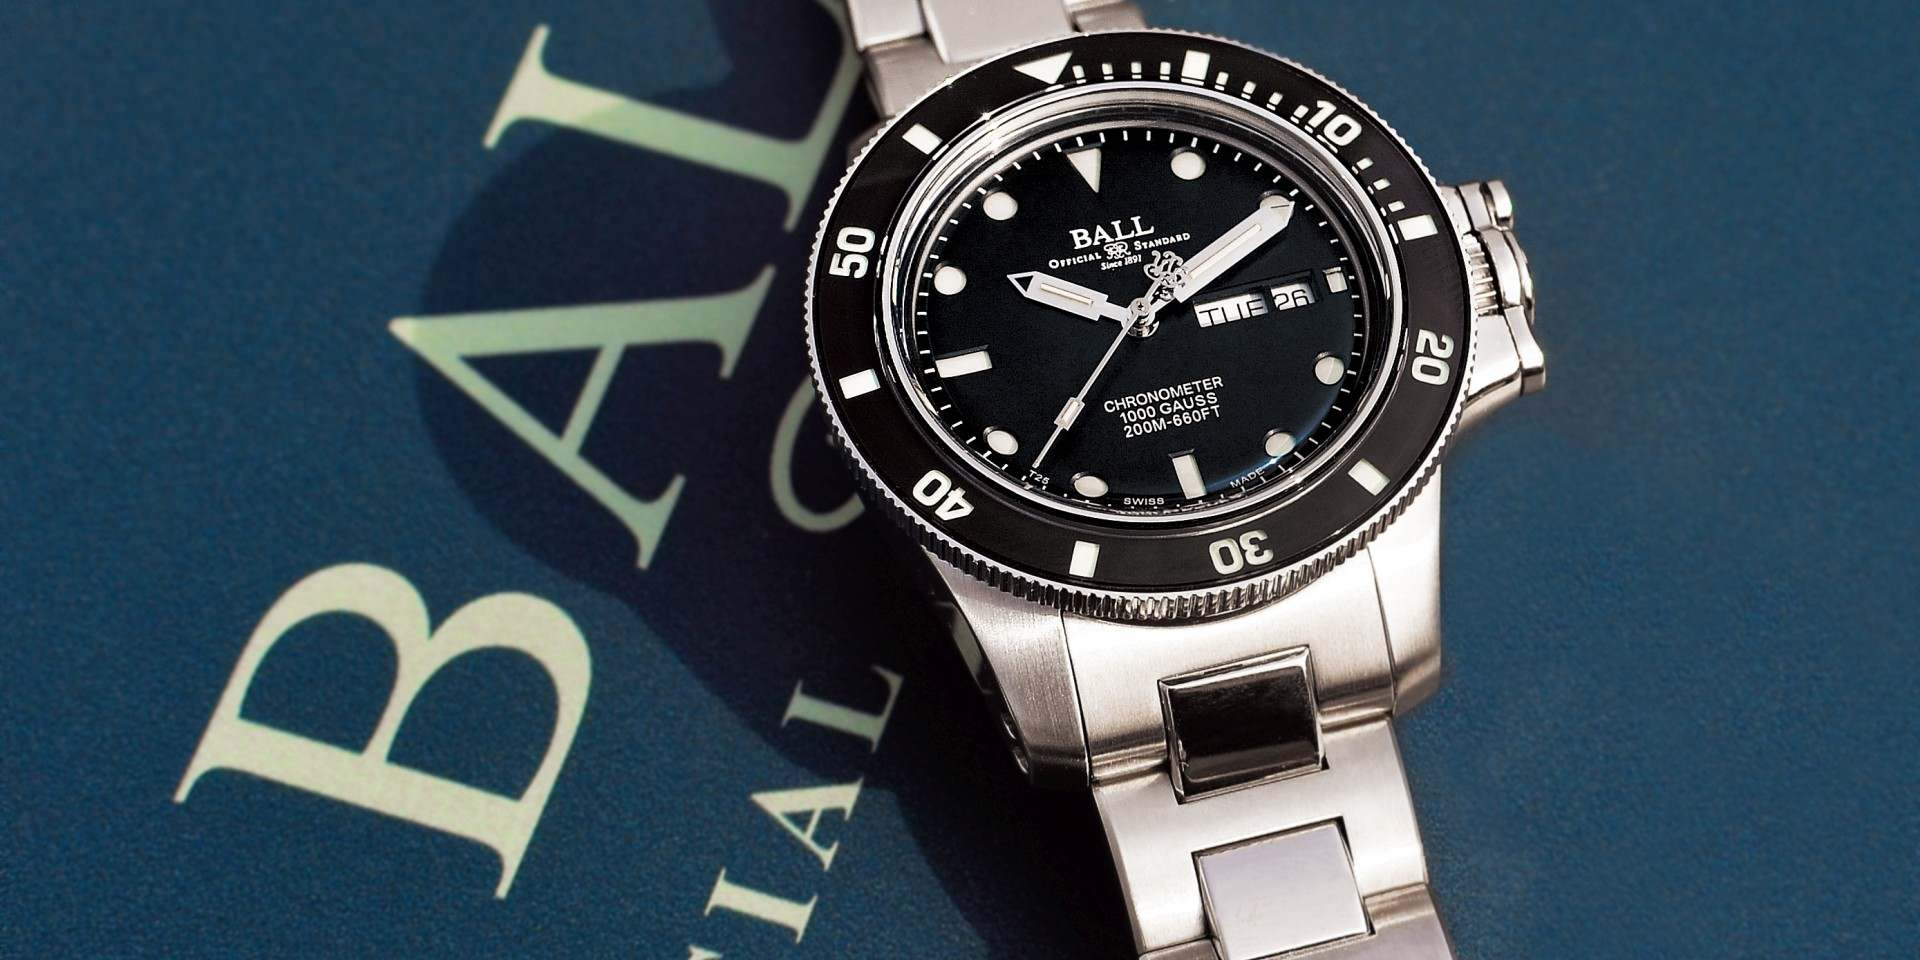 堅準的總和:BALL Watch Engineer Hydrocarbon Original 15周年深海潛水腕錶